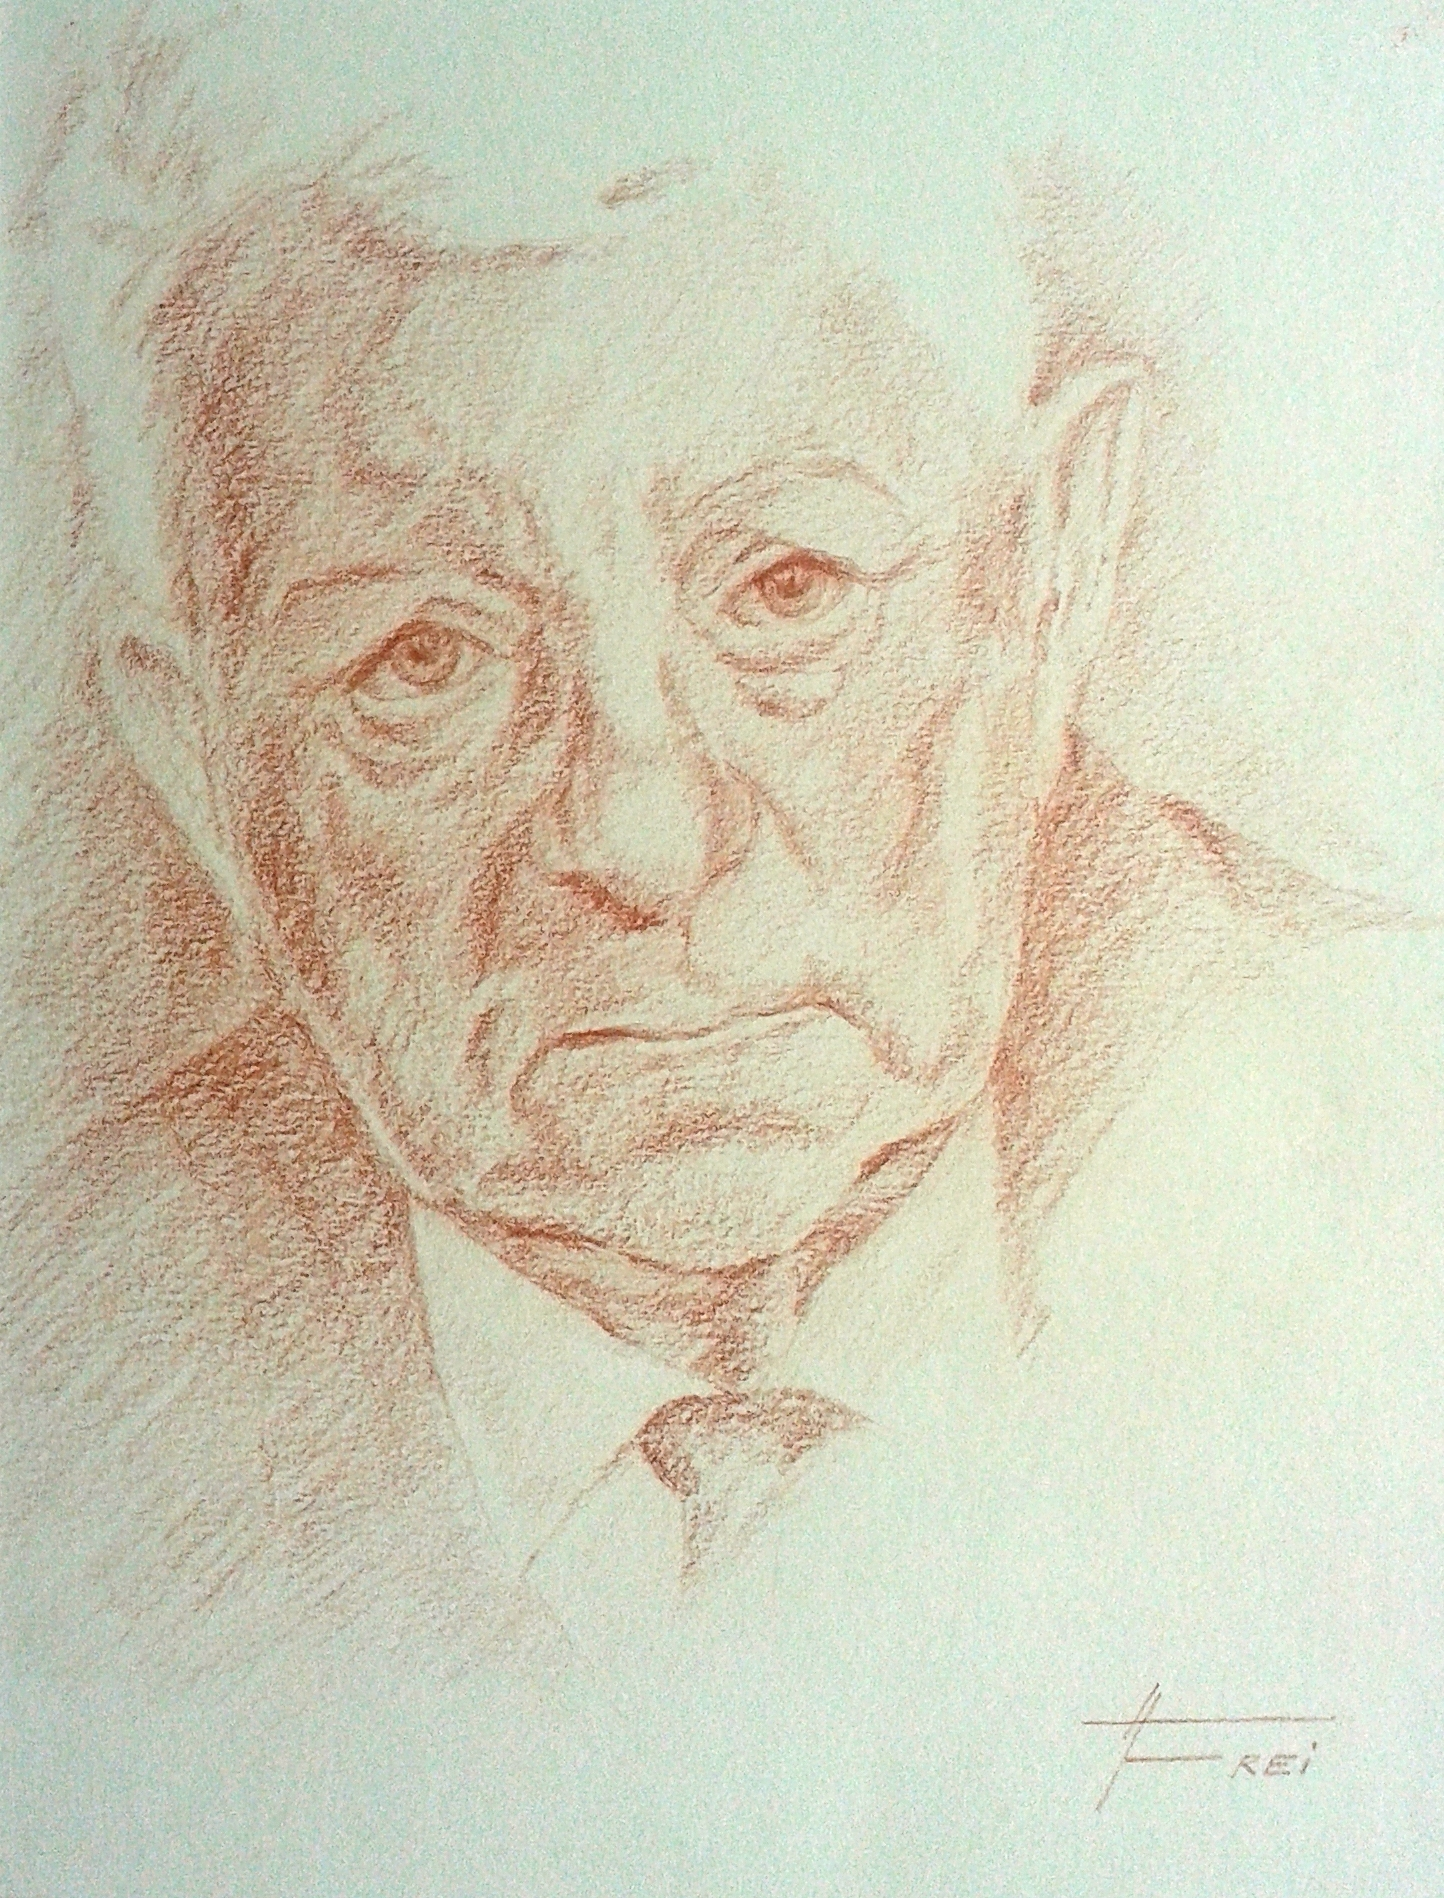 ART HFrei - J. Gabin - Rötelstift